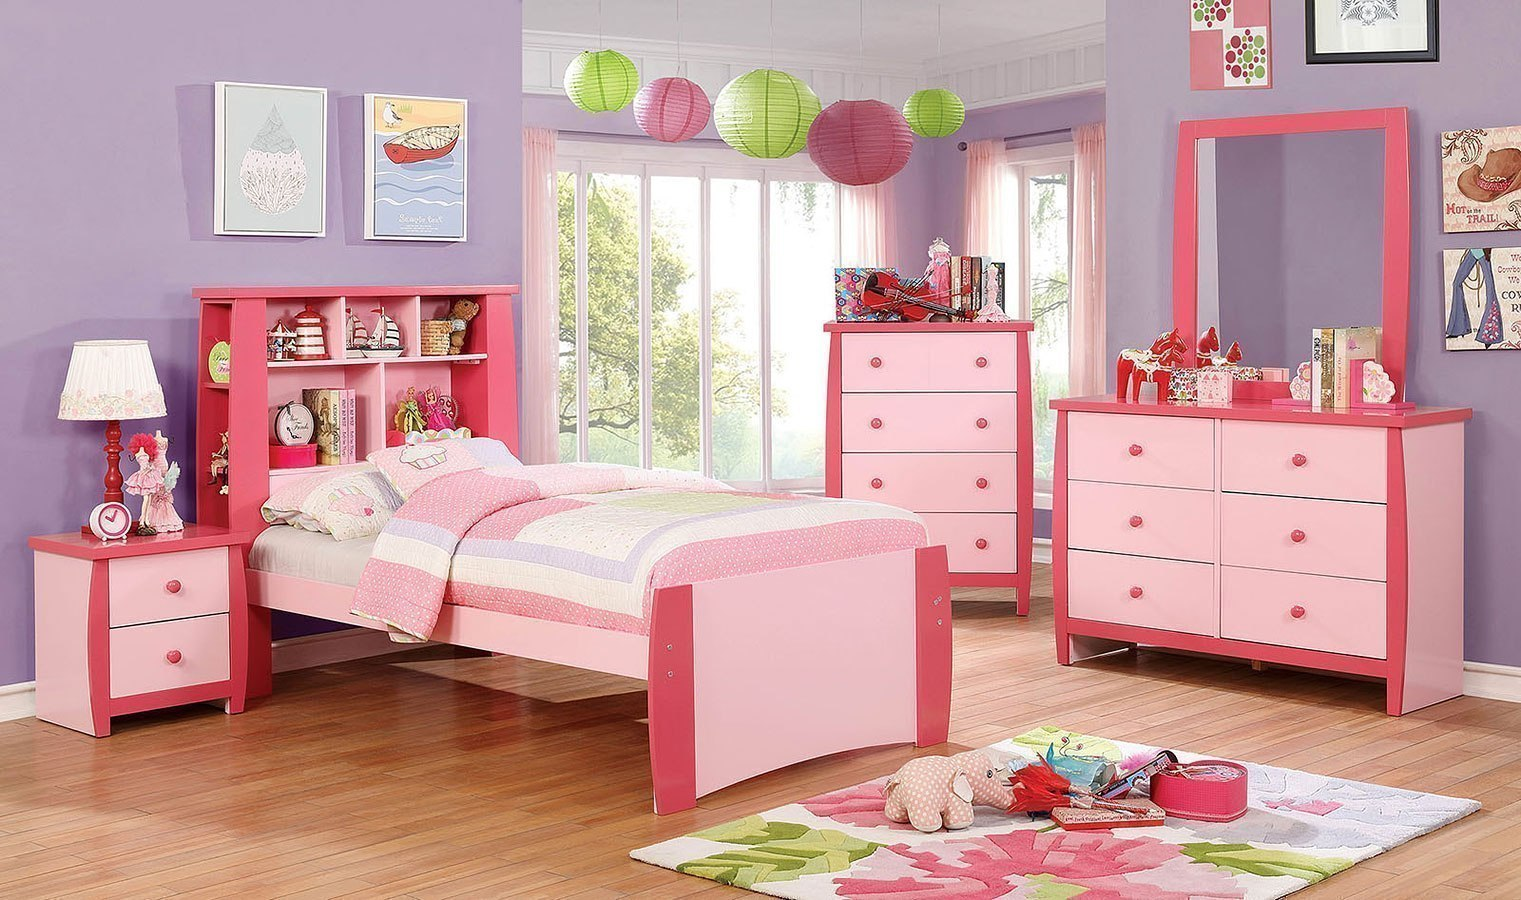 Marlee Youth Bookcase Bedroom Set Pink